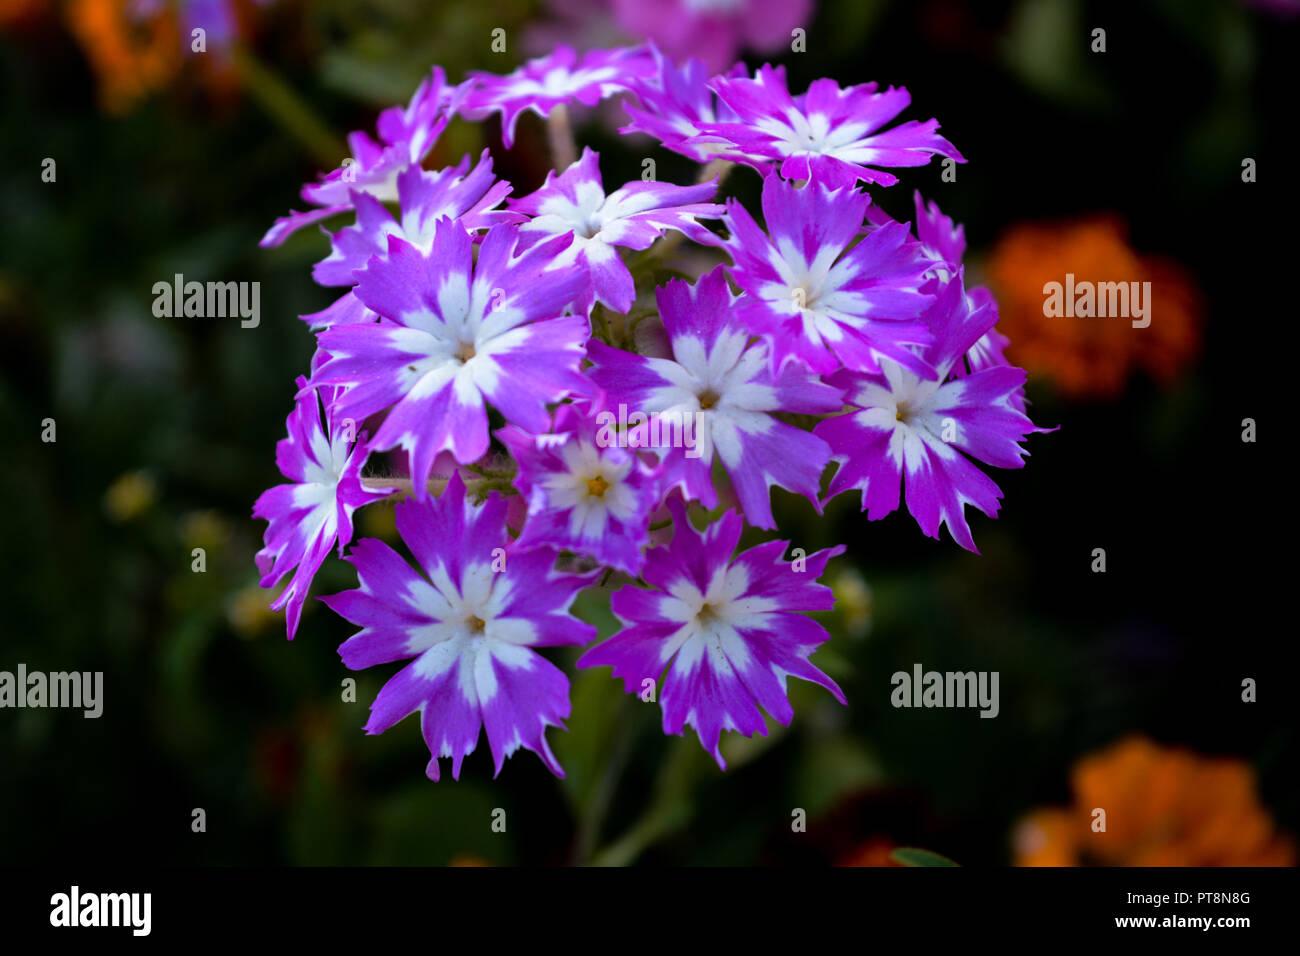 Night jasmine stock photos night jasmine stock images alamy purple flowers captured in himachal pradesh india stock image izmirmasajfo